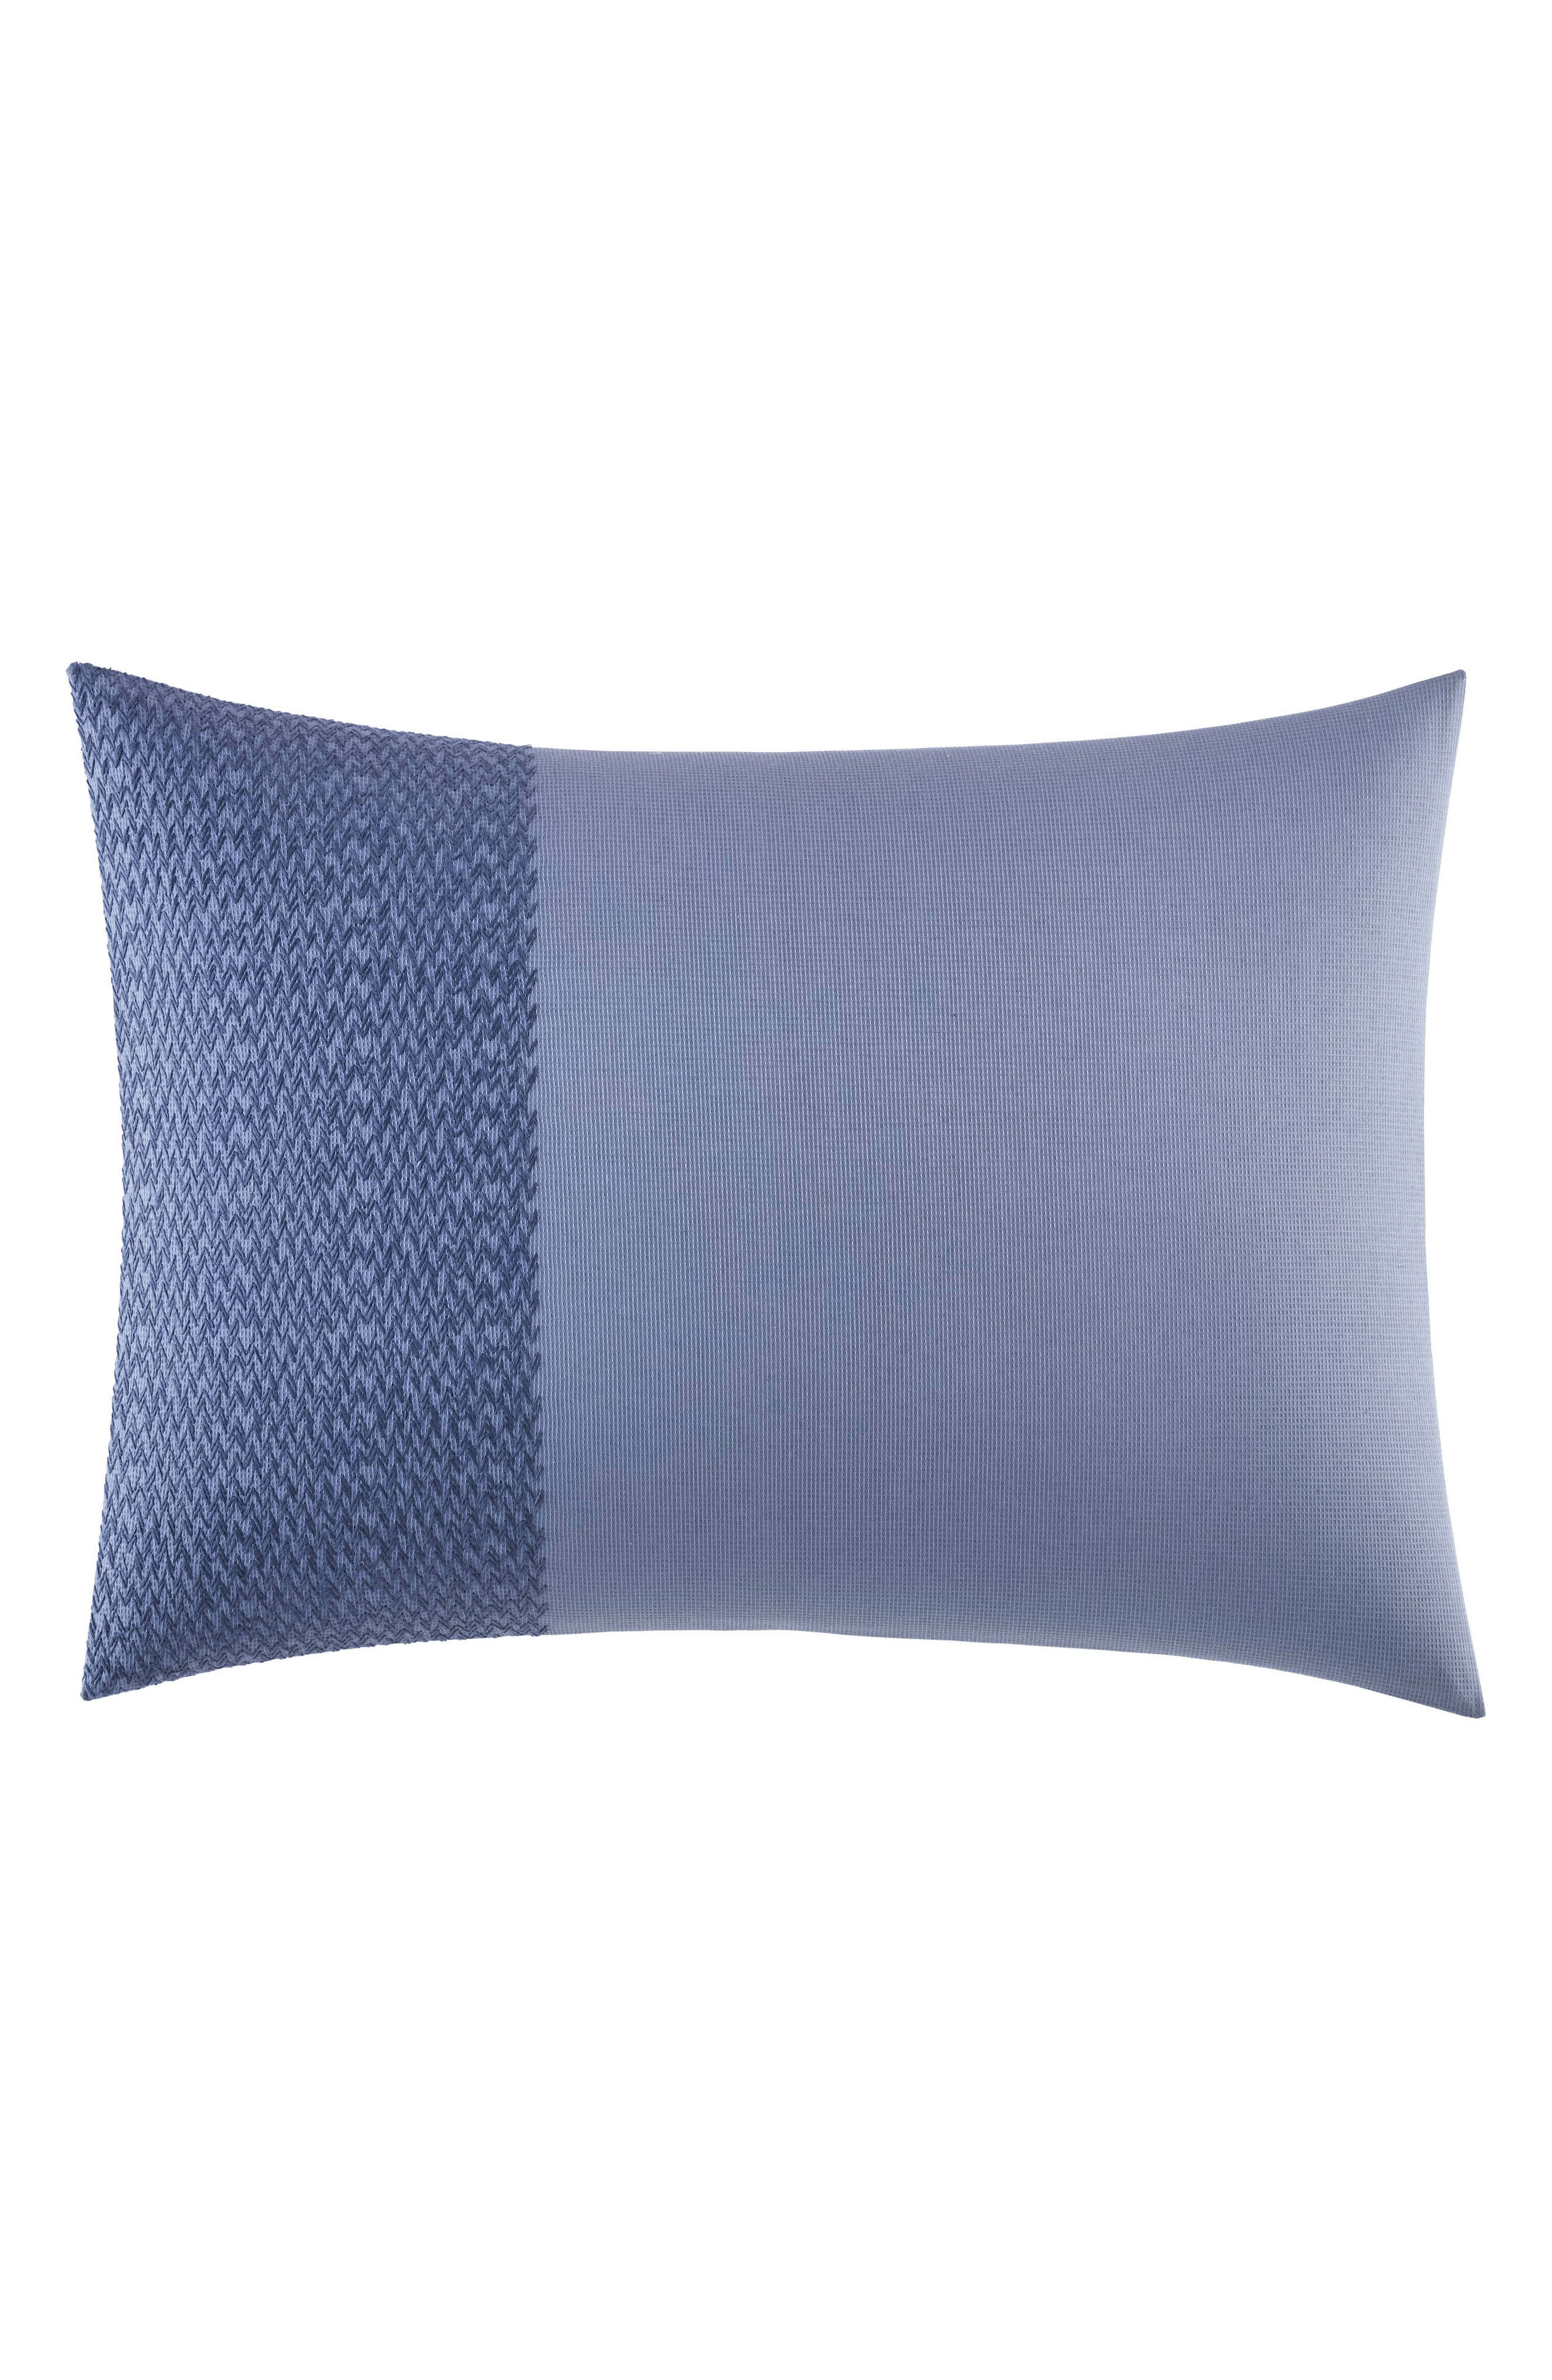 Chevron Breakfast Pillow,                         Main,                         color,